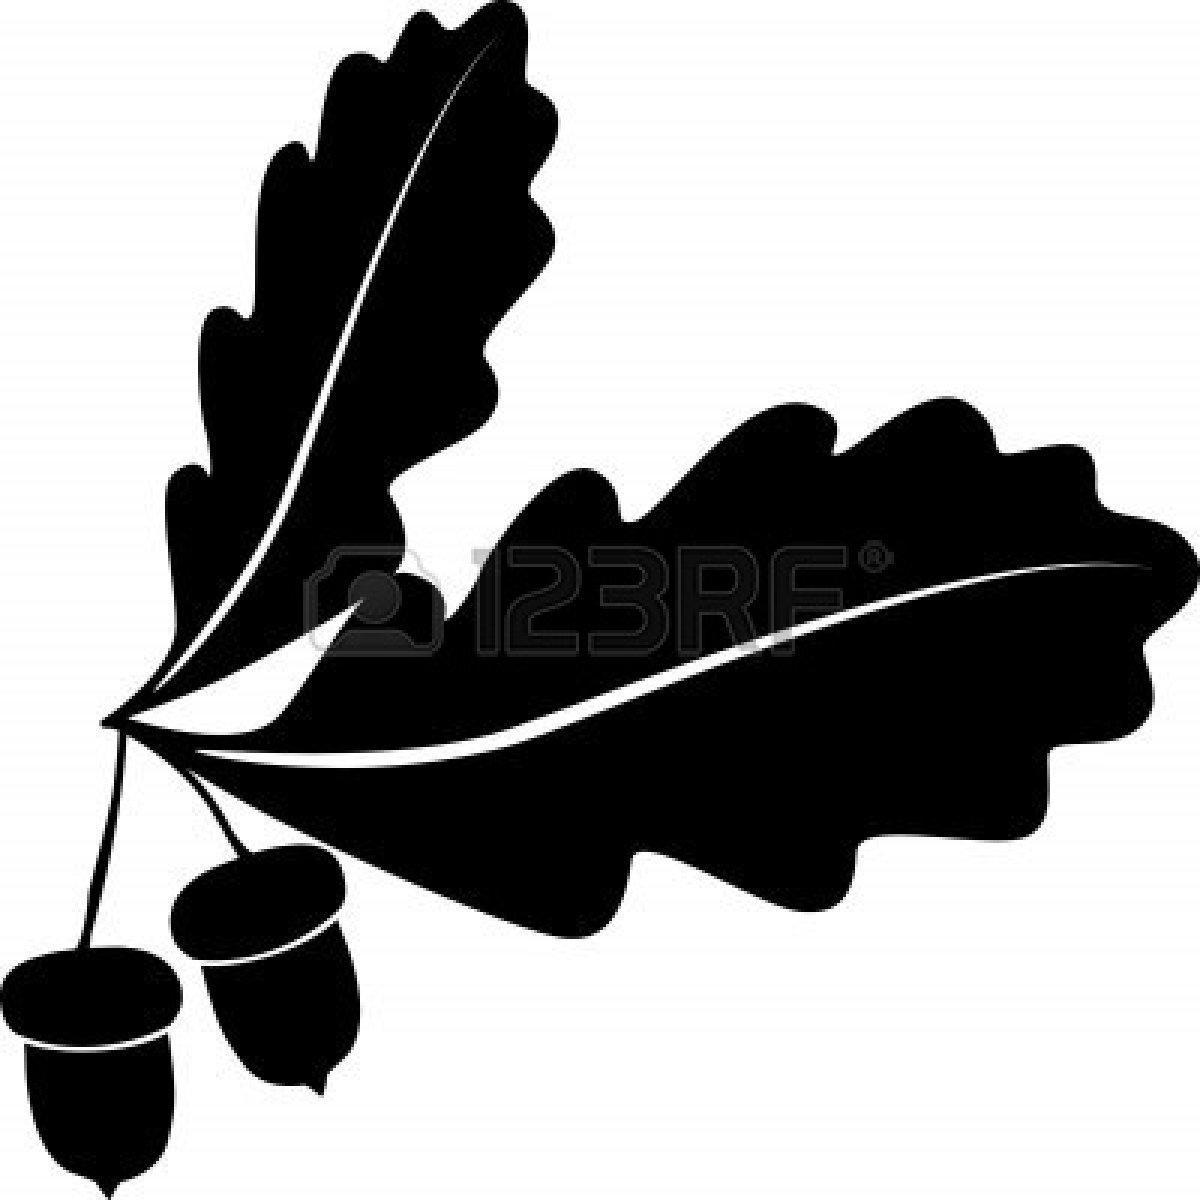 oak tree silhouette vector at getdrawings com free for personal rh getdrawings com oak leaf vector free download oak leaf vector free download